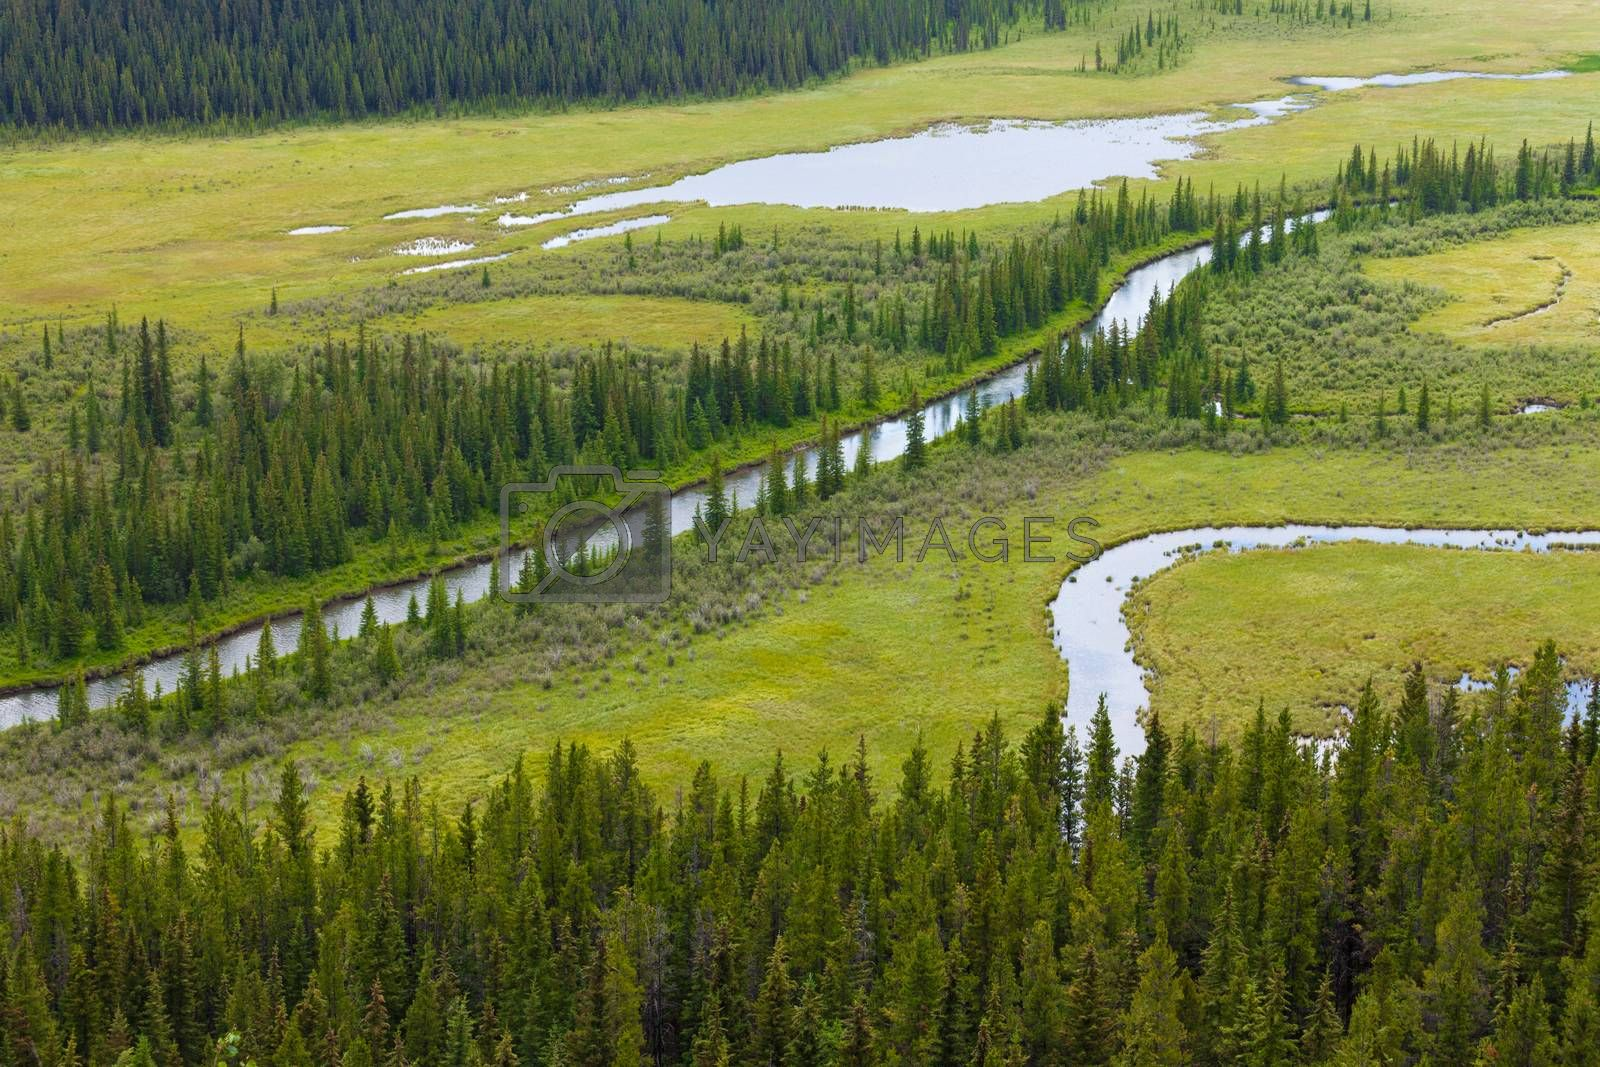 Marshland river riparian wetland landscape by PiLens